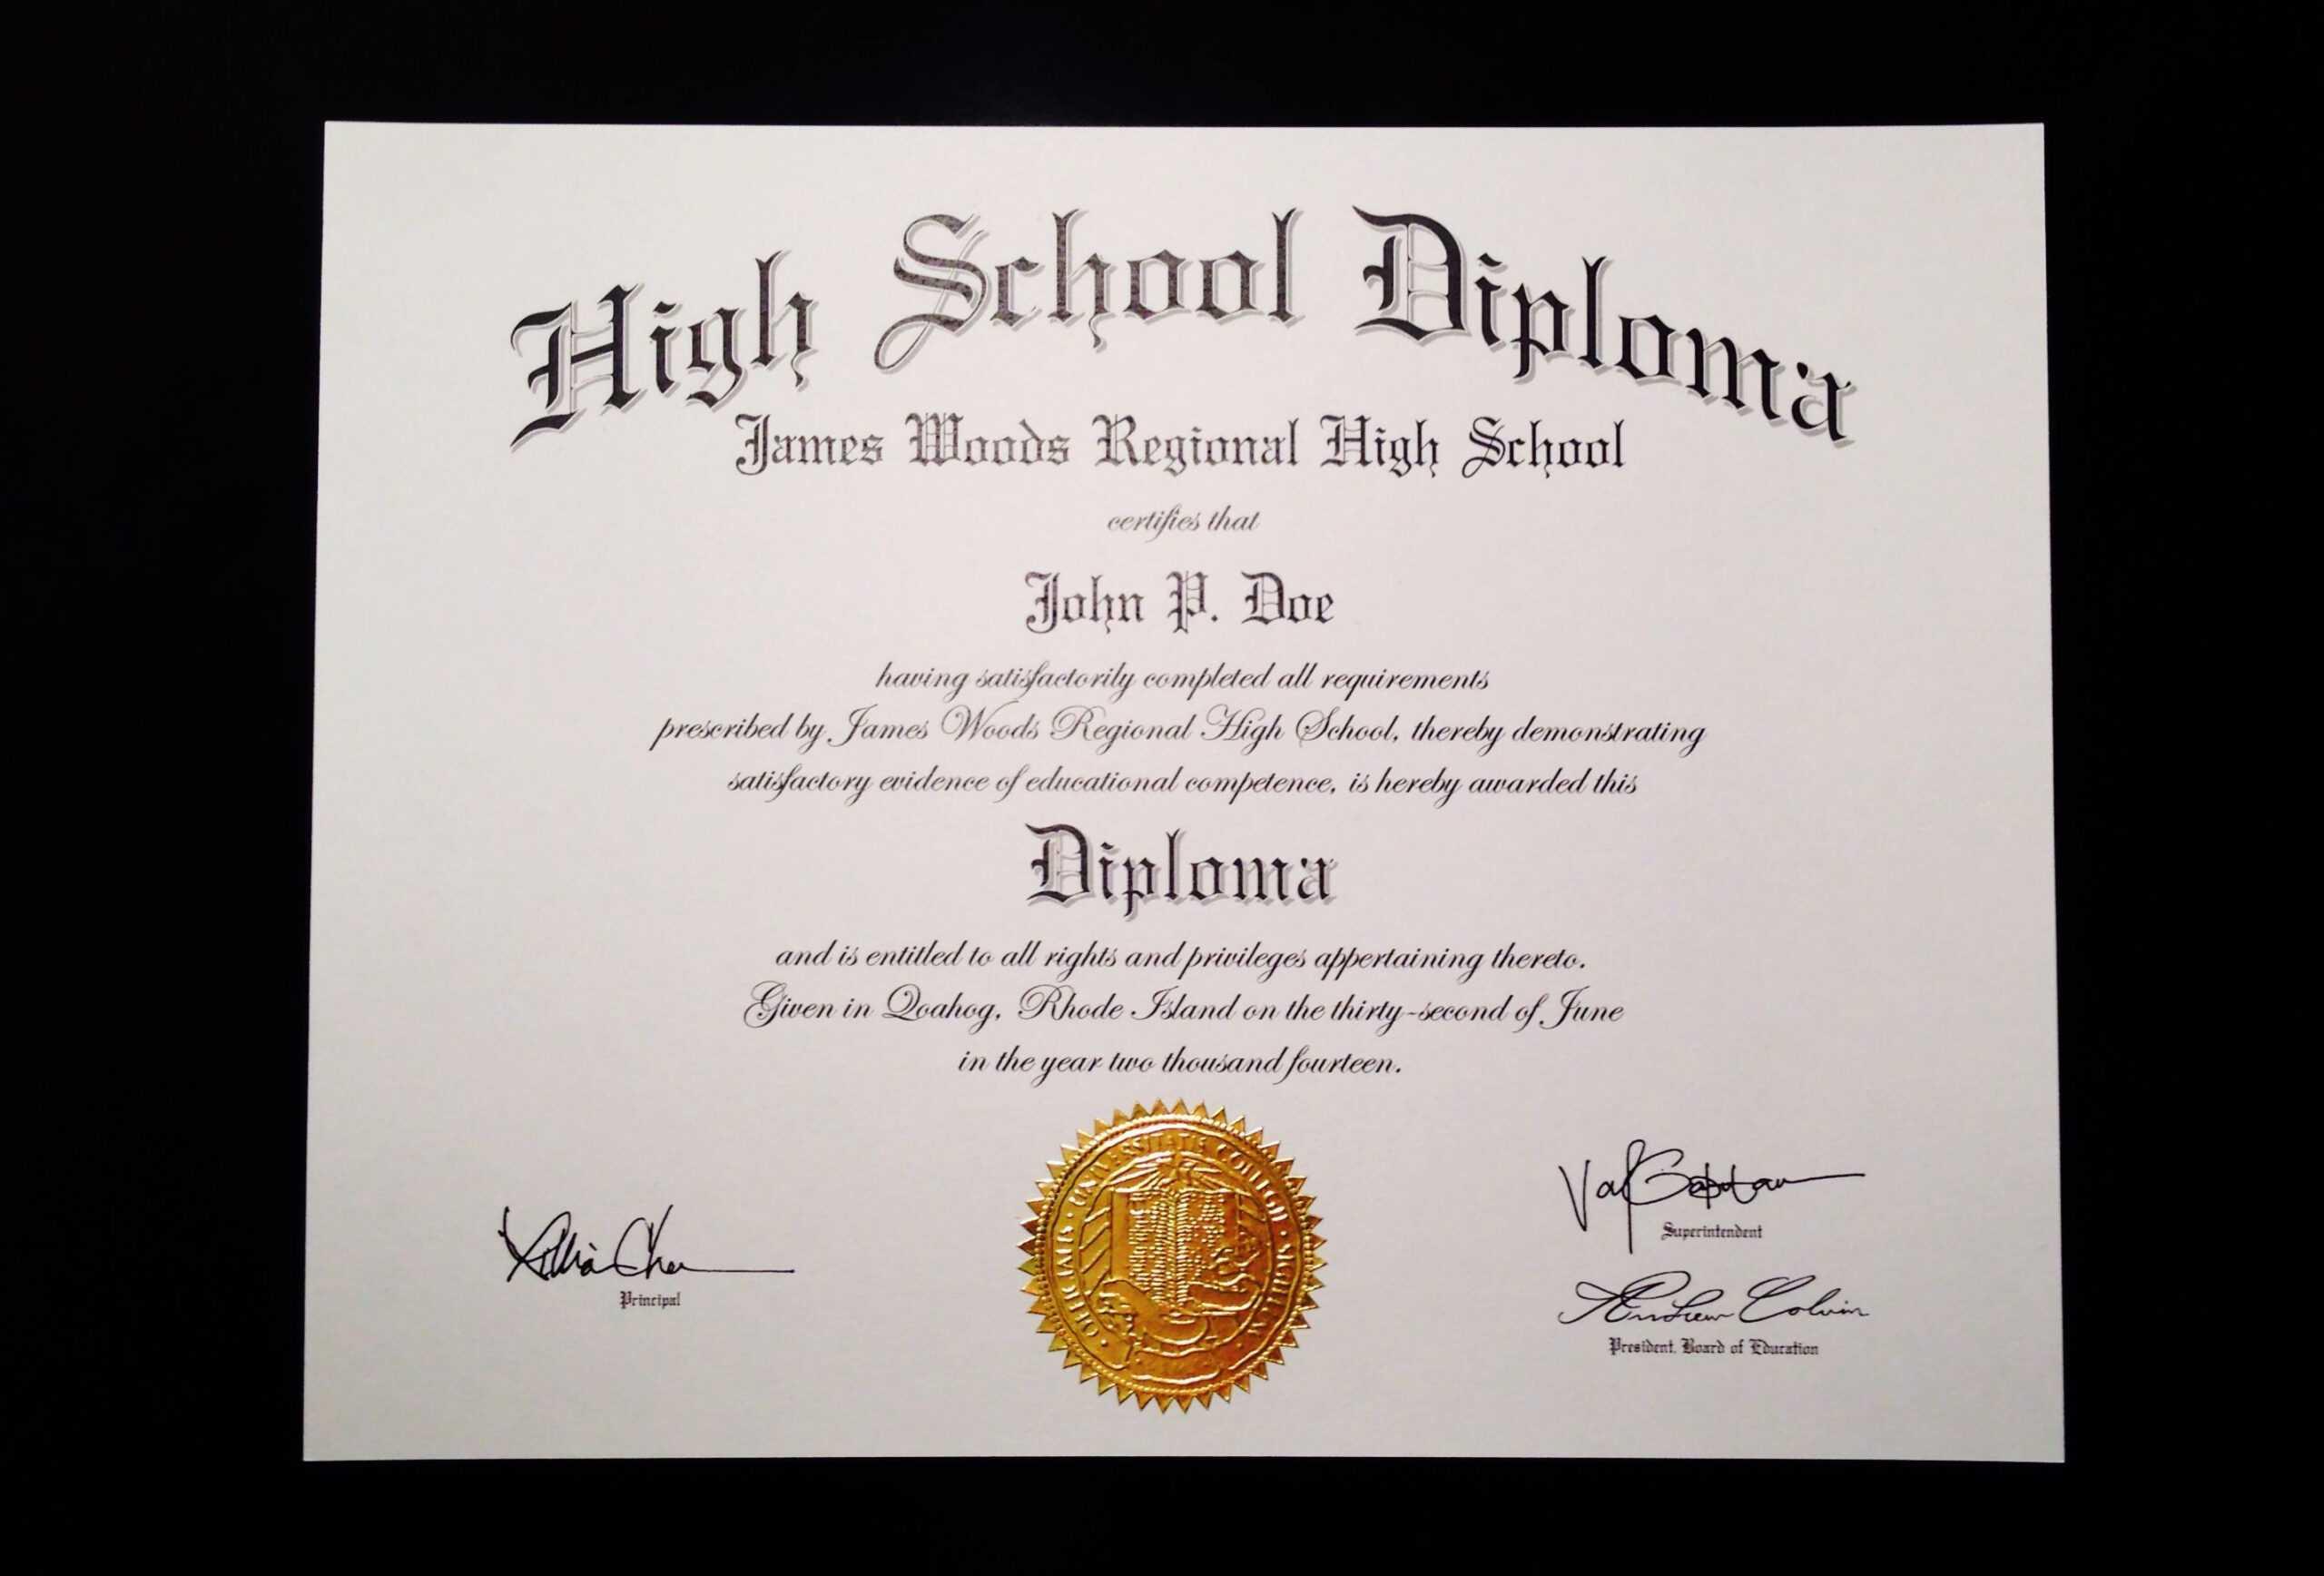 Fake+High+School+Diploma+Template | High School Diploma With Fake Diploma Certificate Template